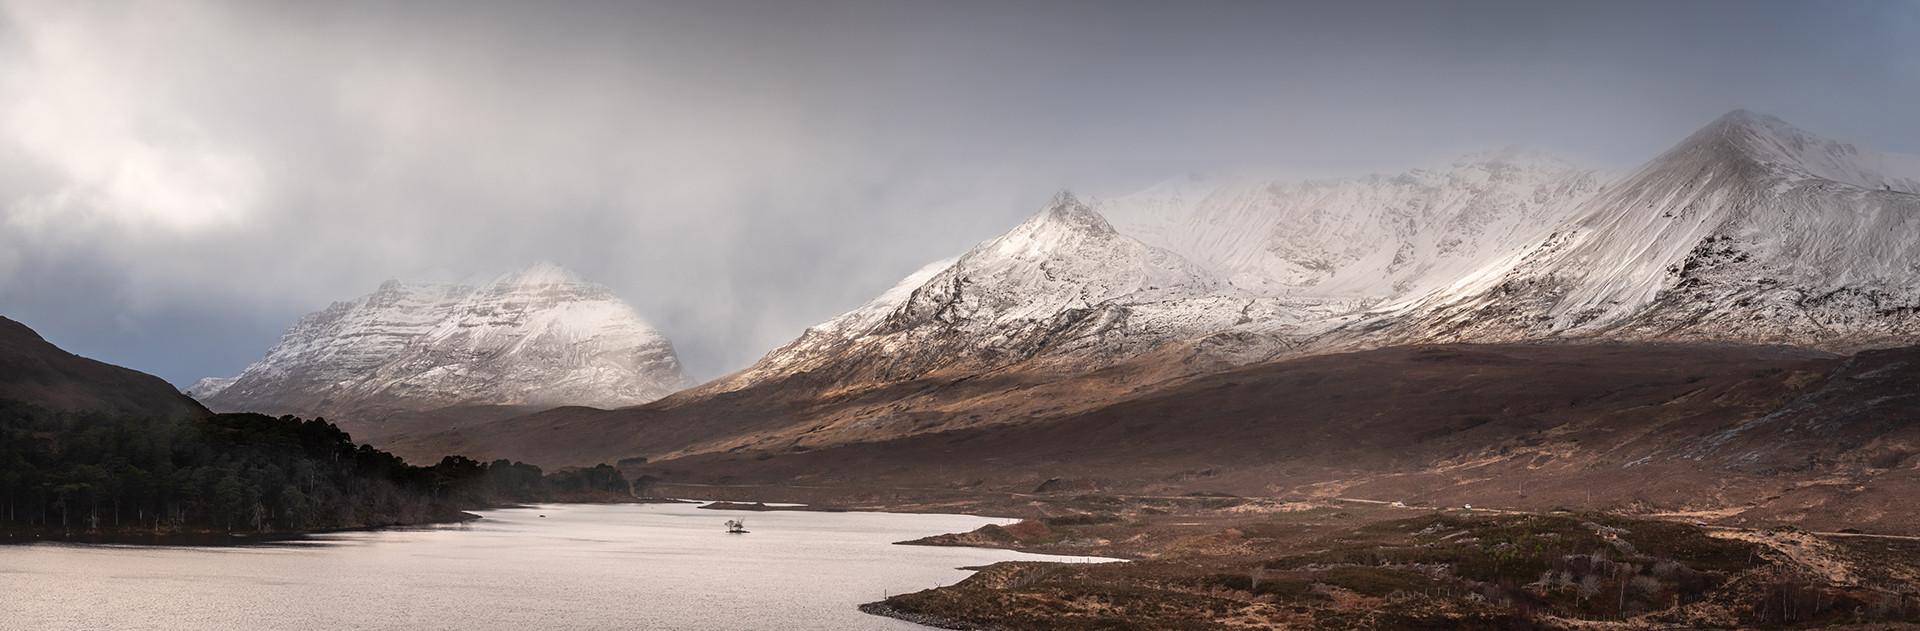 Across Loch Clair - Andrew Daw